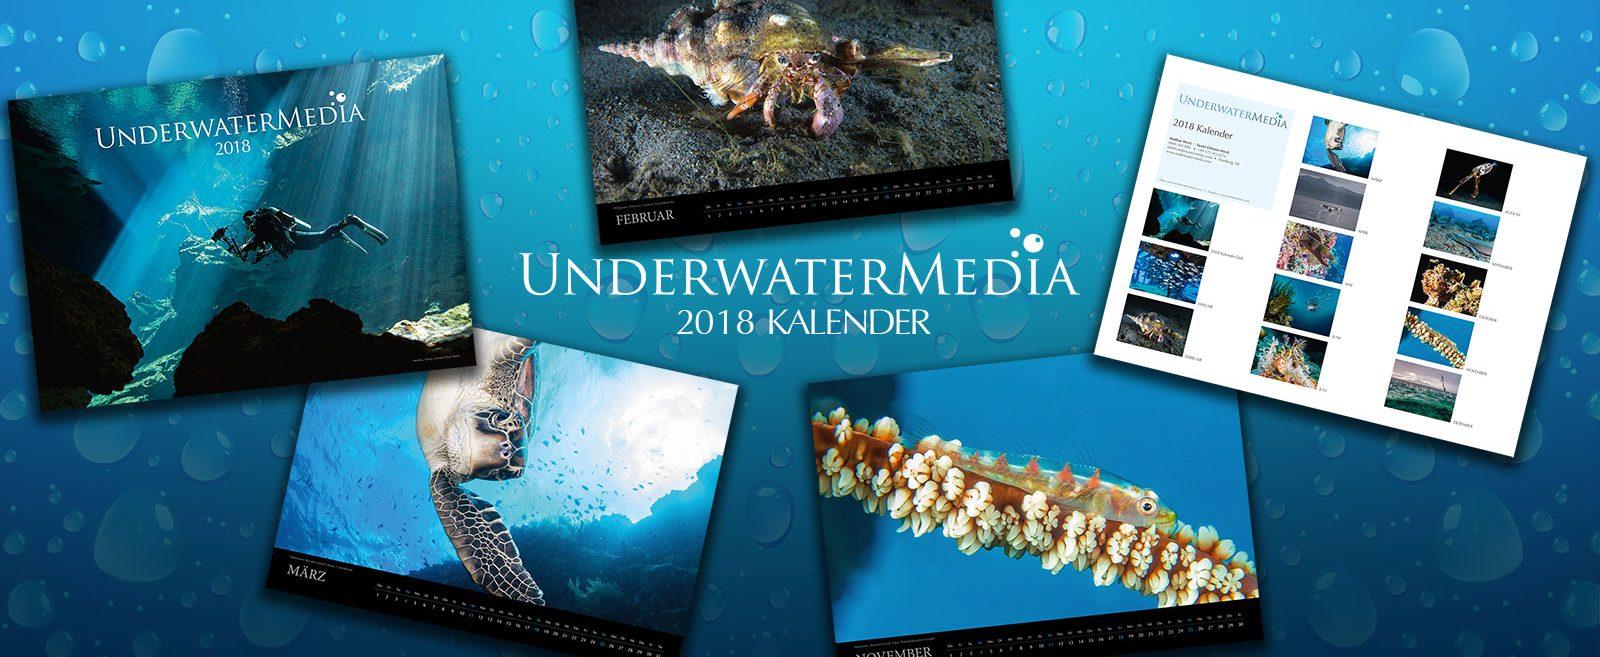 Underwater Media Calendar 2018